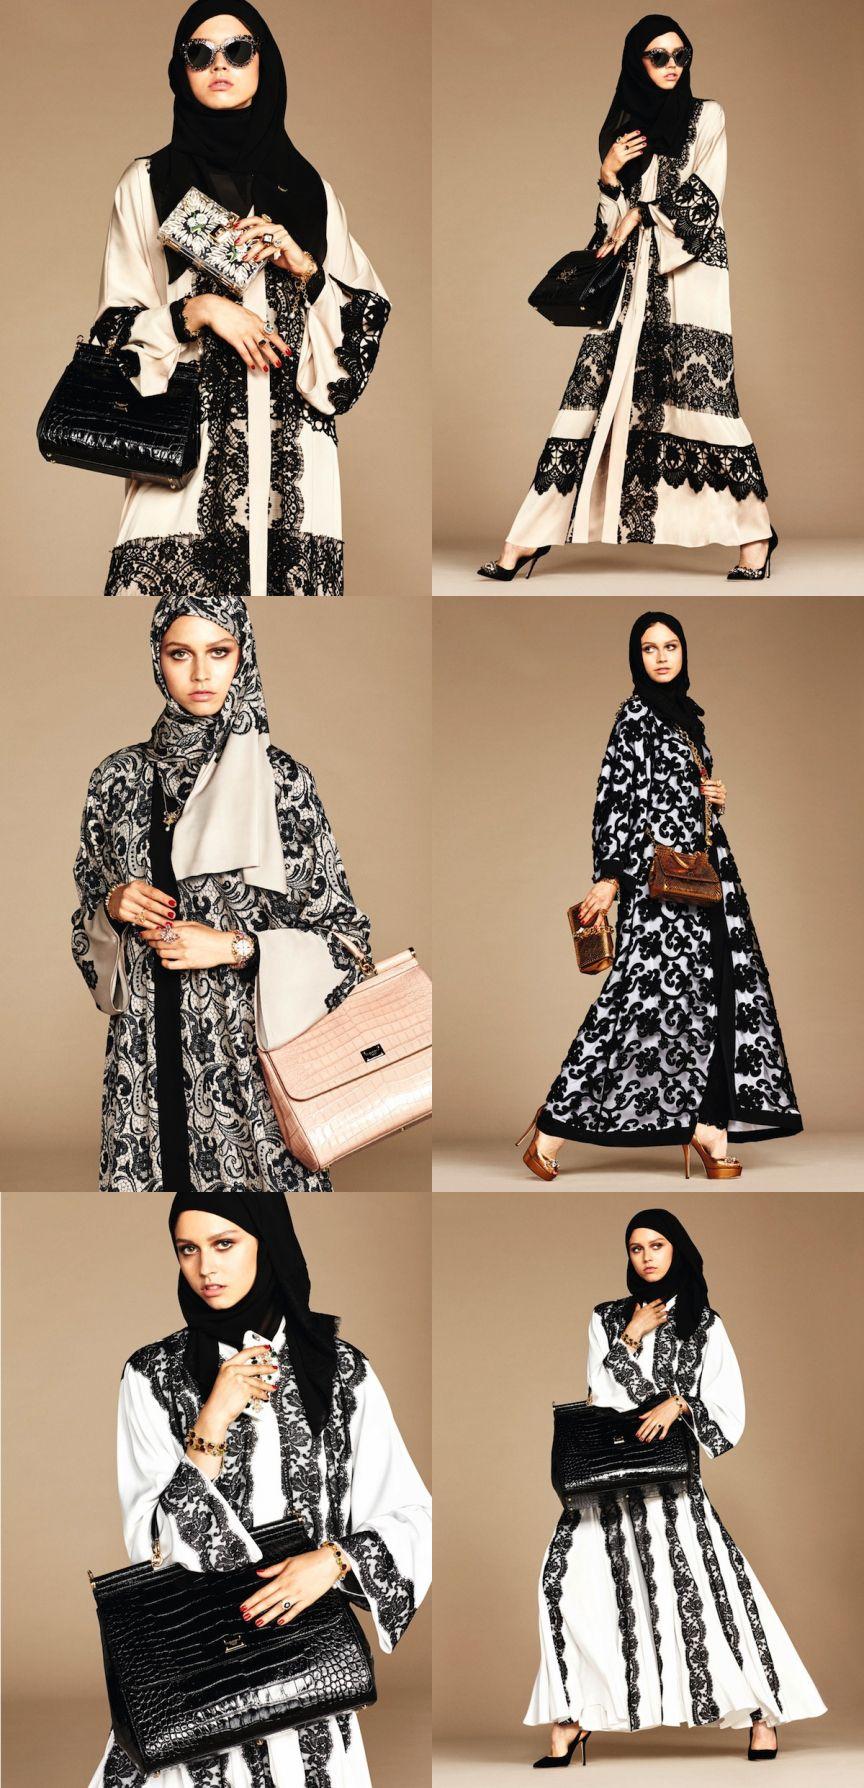 Dolce and Gabbana hijab and abaya1   Islam   Pinterest   Pano 0bcf4704d0